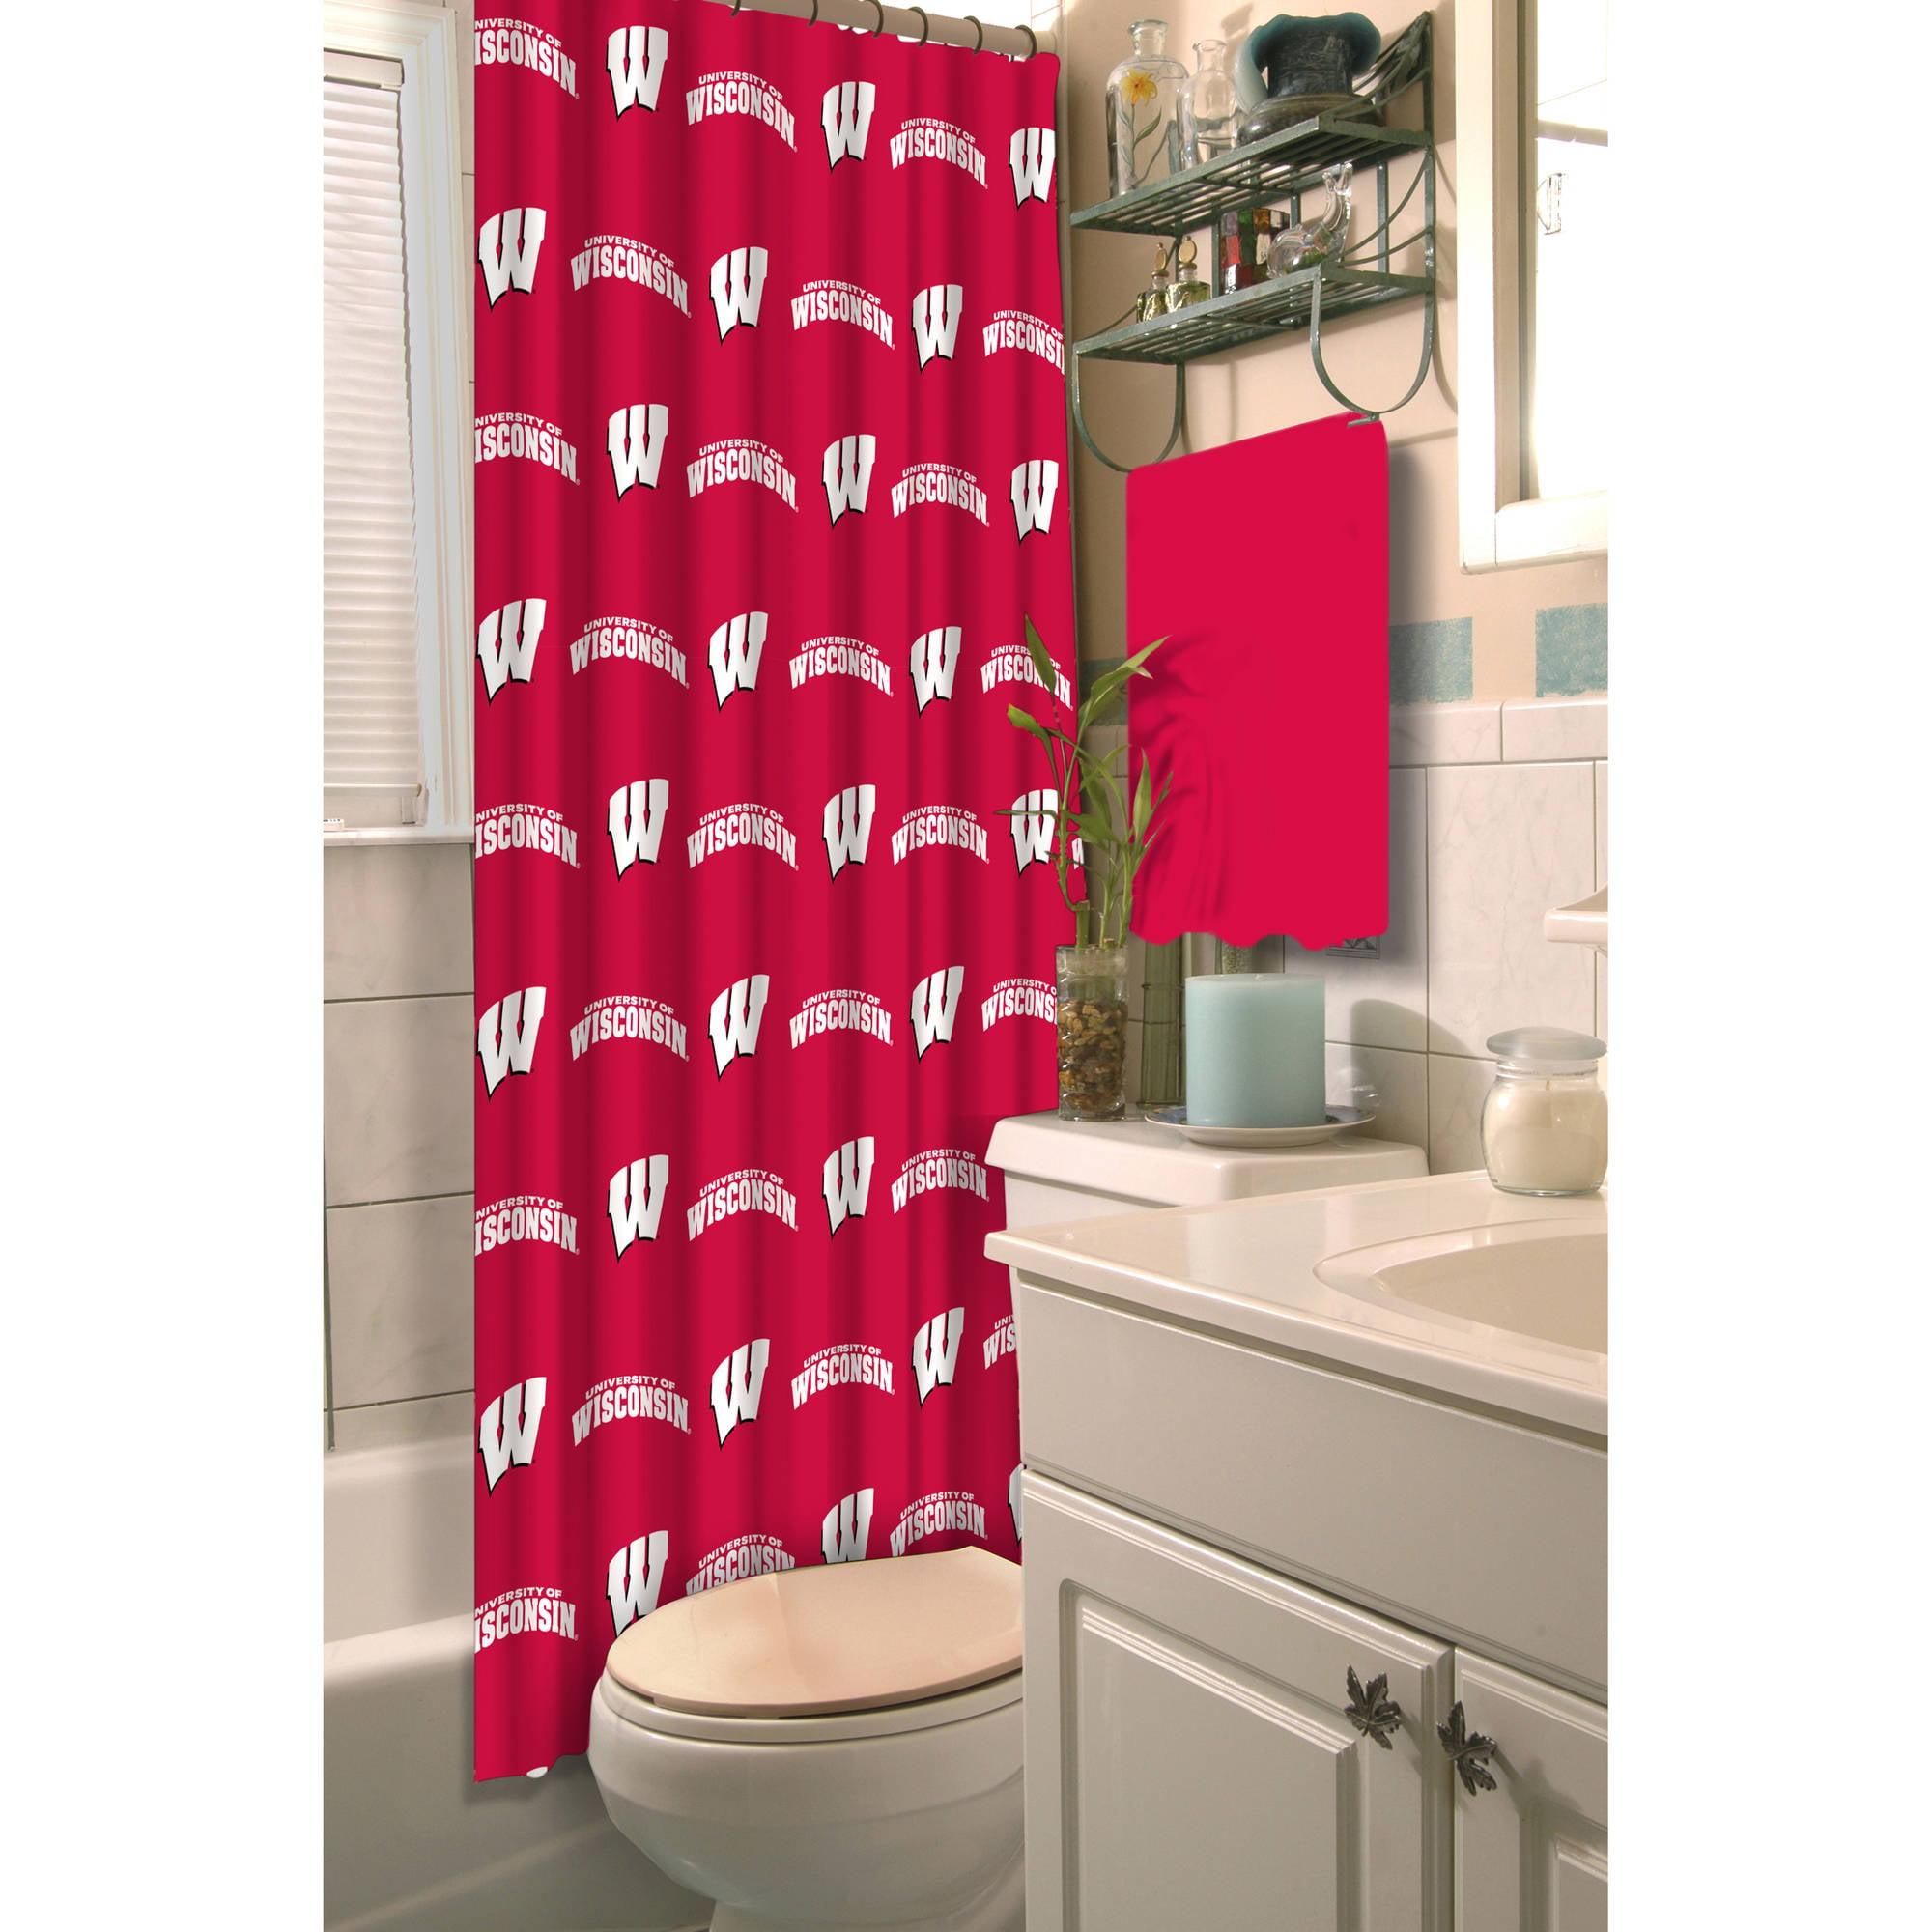 NCAA Shower Curtain, Wisconsin